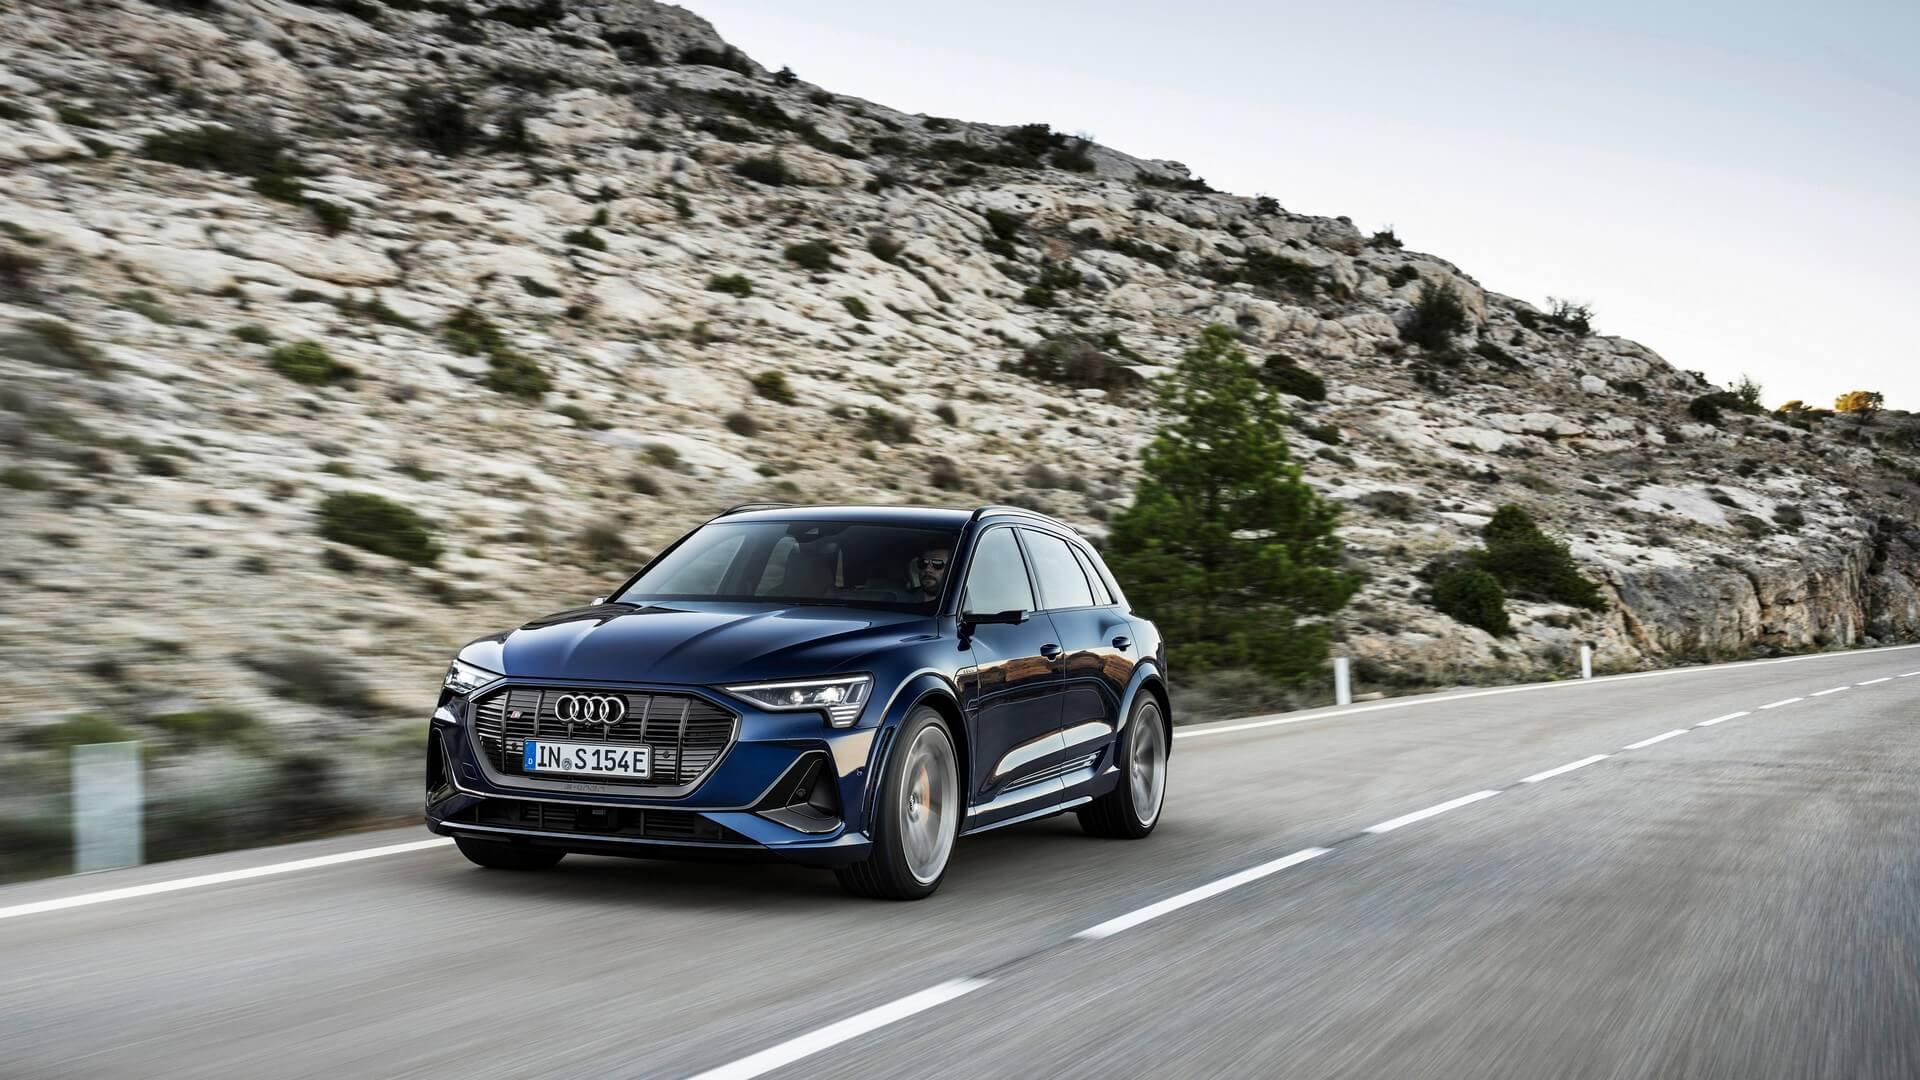 Audi-E-Tron-S-and-E-Tron-S-Sportback-2020-14